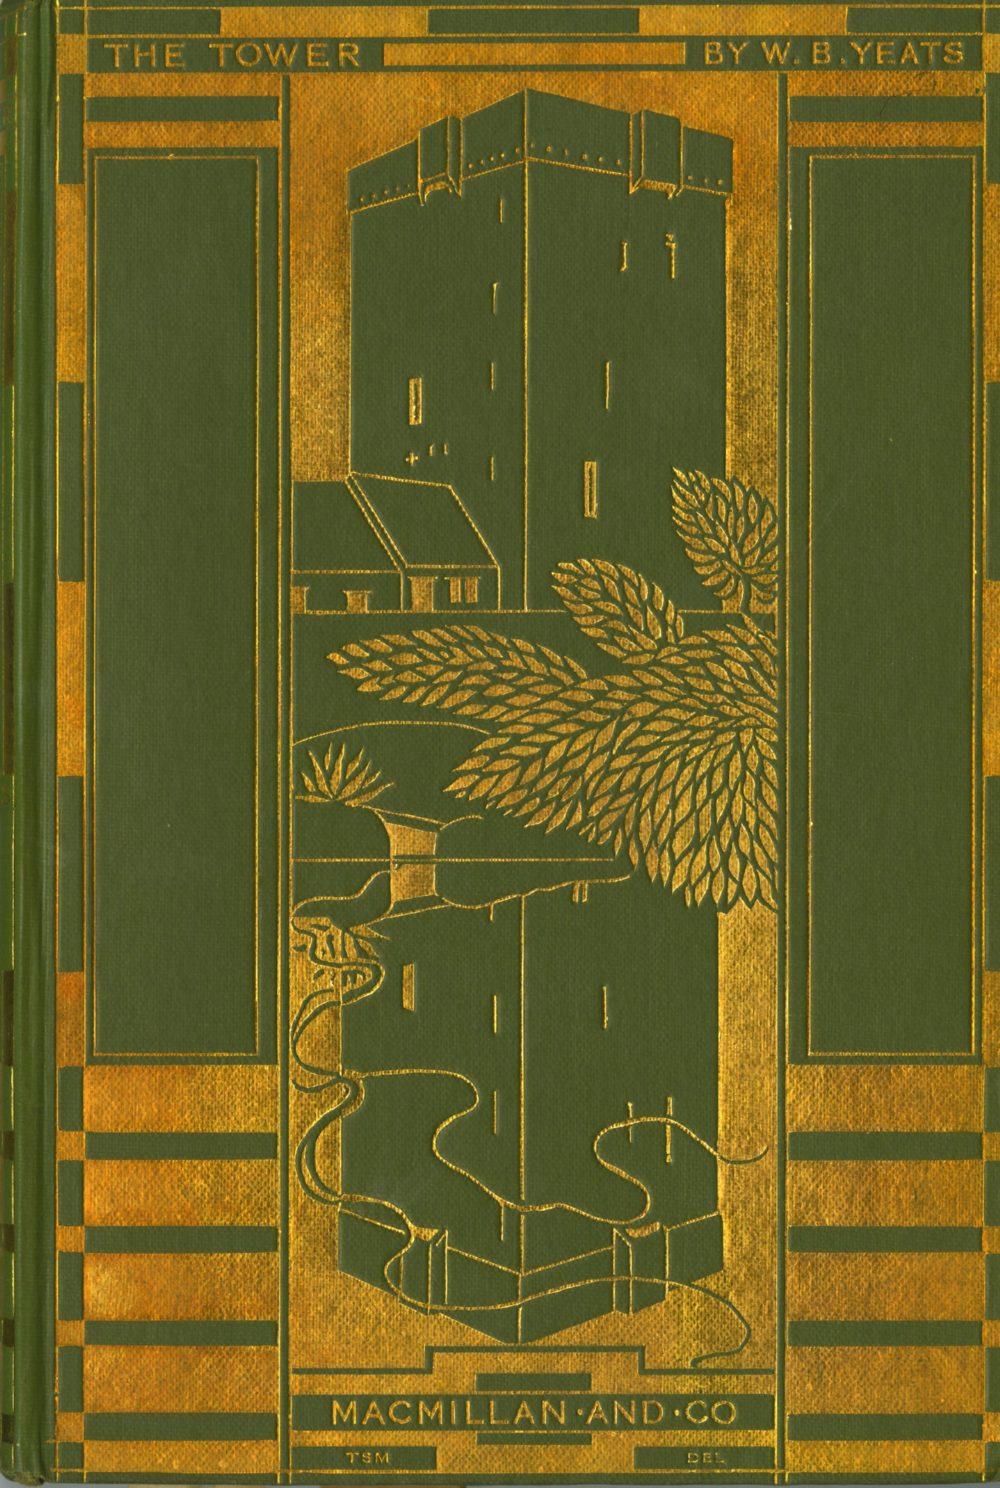 Yeats (W.B.) The Tower, 8vo L. (Mac Millan & Co.) 1928, First, gilt decor. pictorial cloth, d.j.